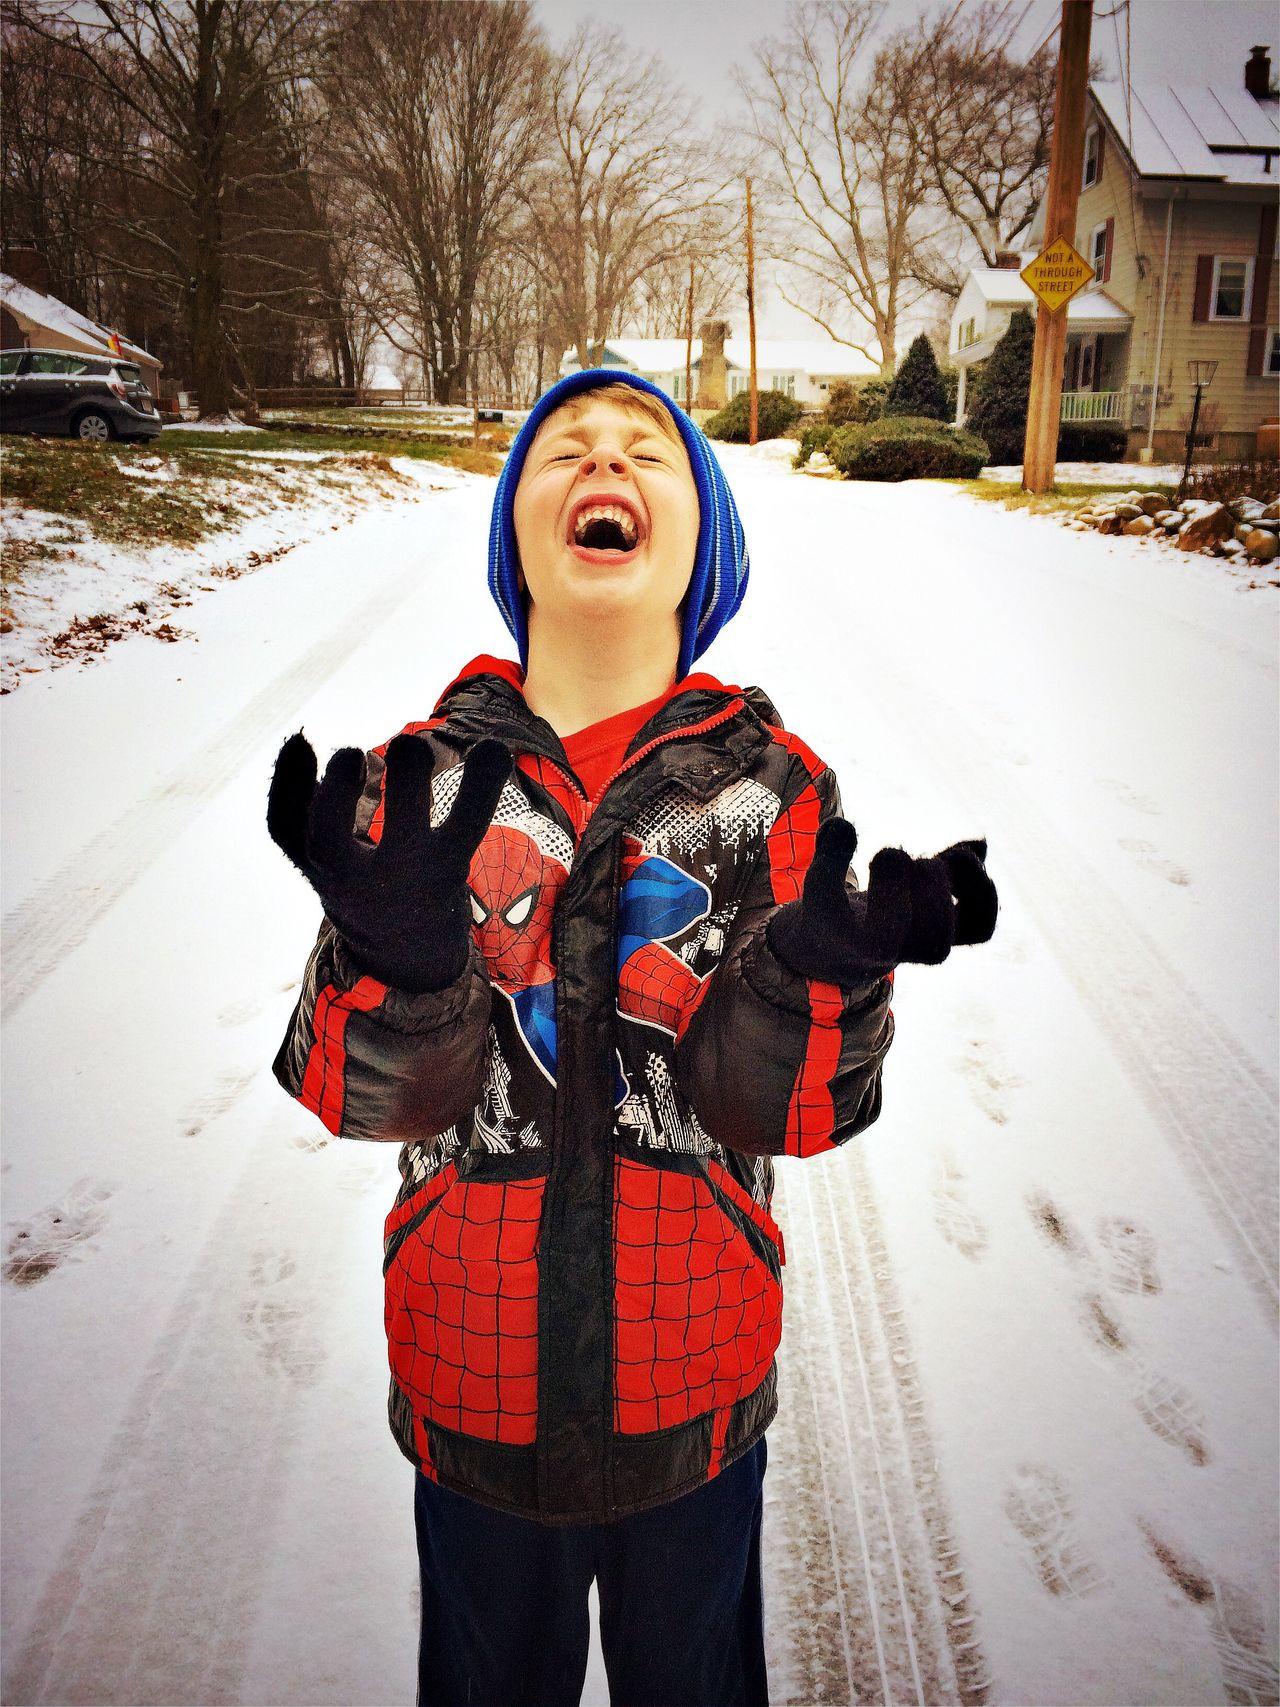 Beautiful stock photos of schneemann, winter, snow, warm clothing, cold temperature